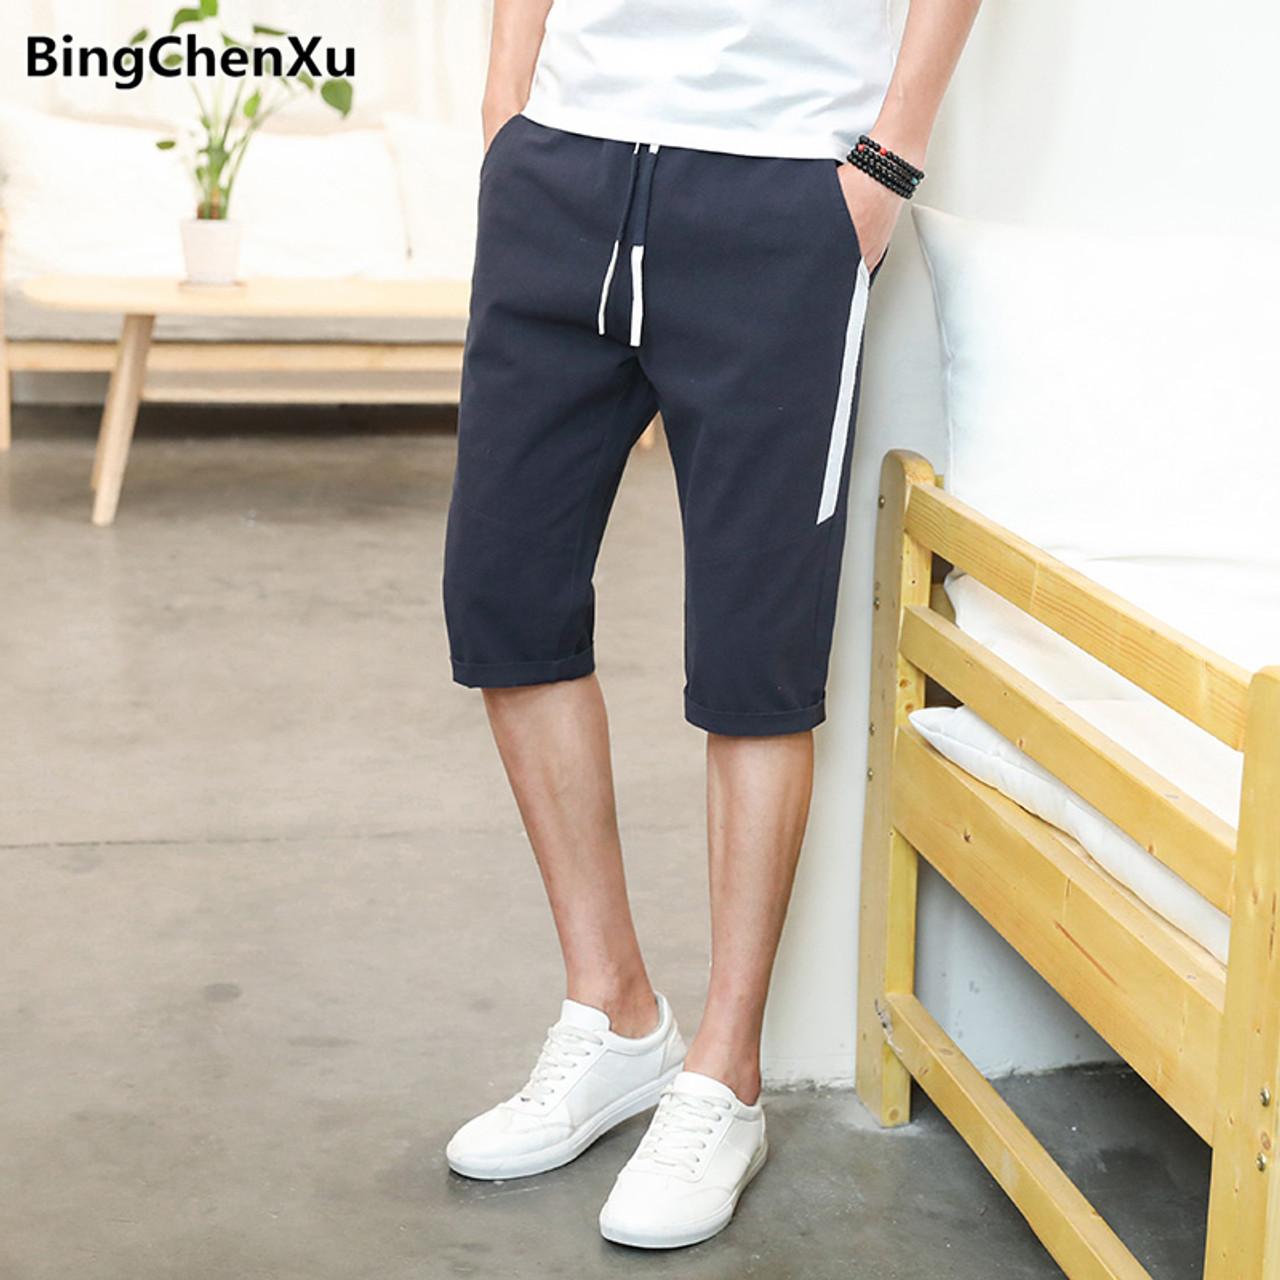 Mens Shorts Summer Board Shorts Elastic Waist Man Short Calf Length Casual Trousers Male Beach Bottoms